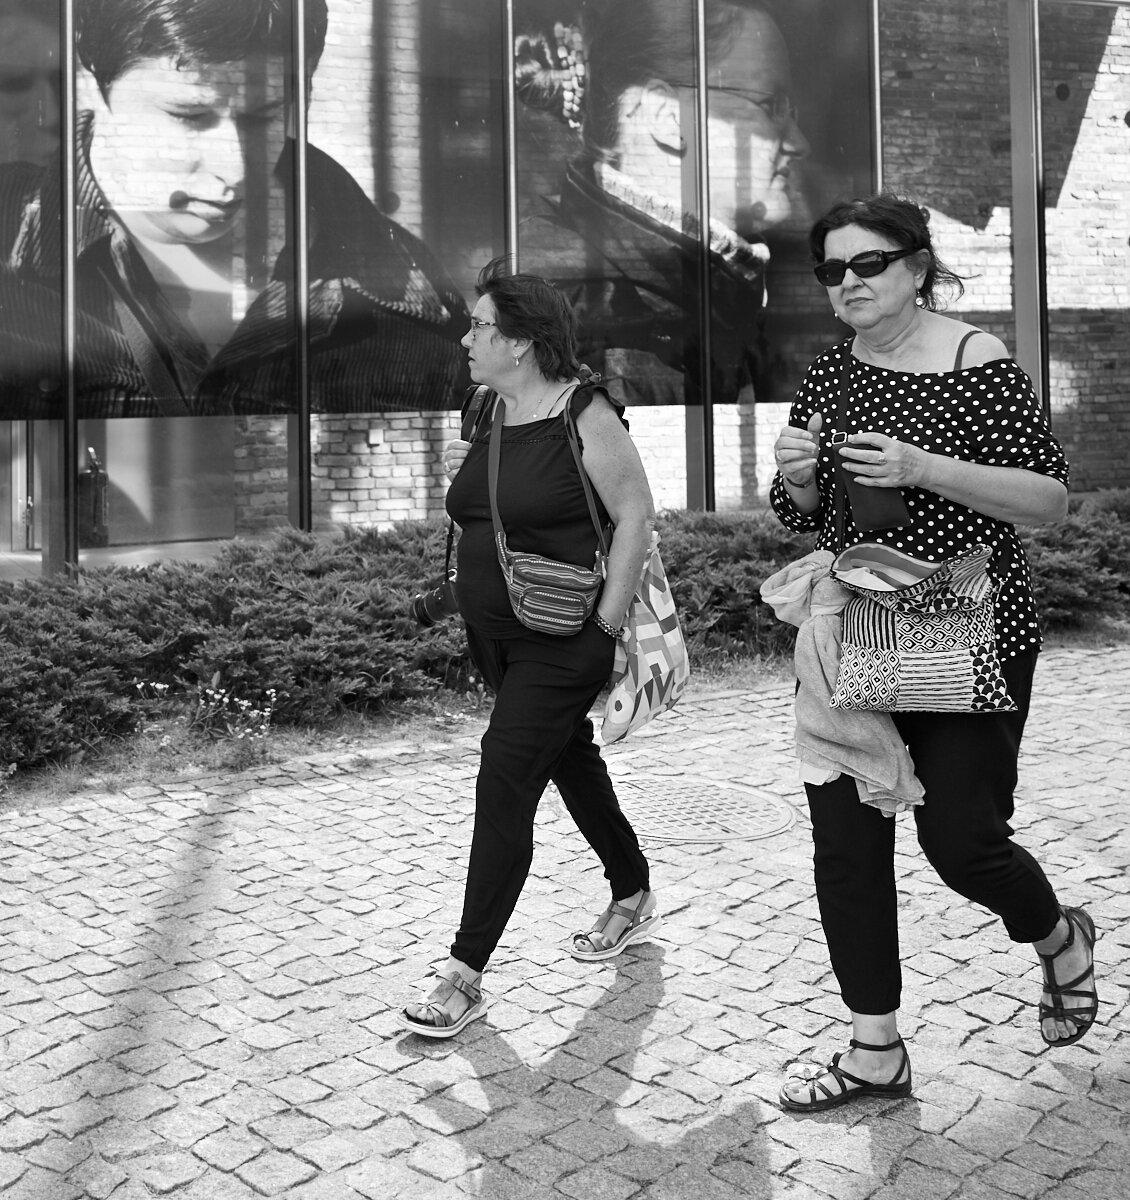 Museum of Contemporary Art 1600x1200 sRGB.jpg